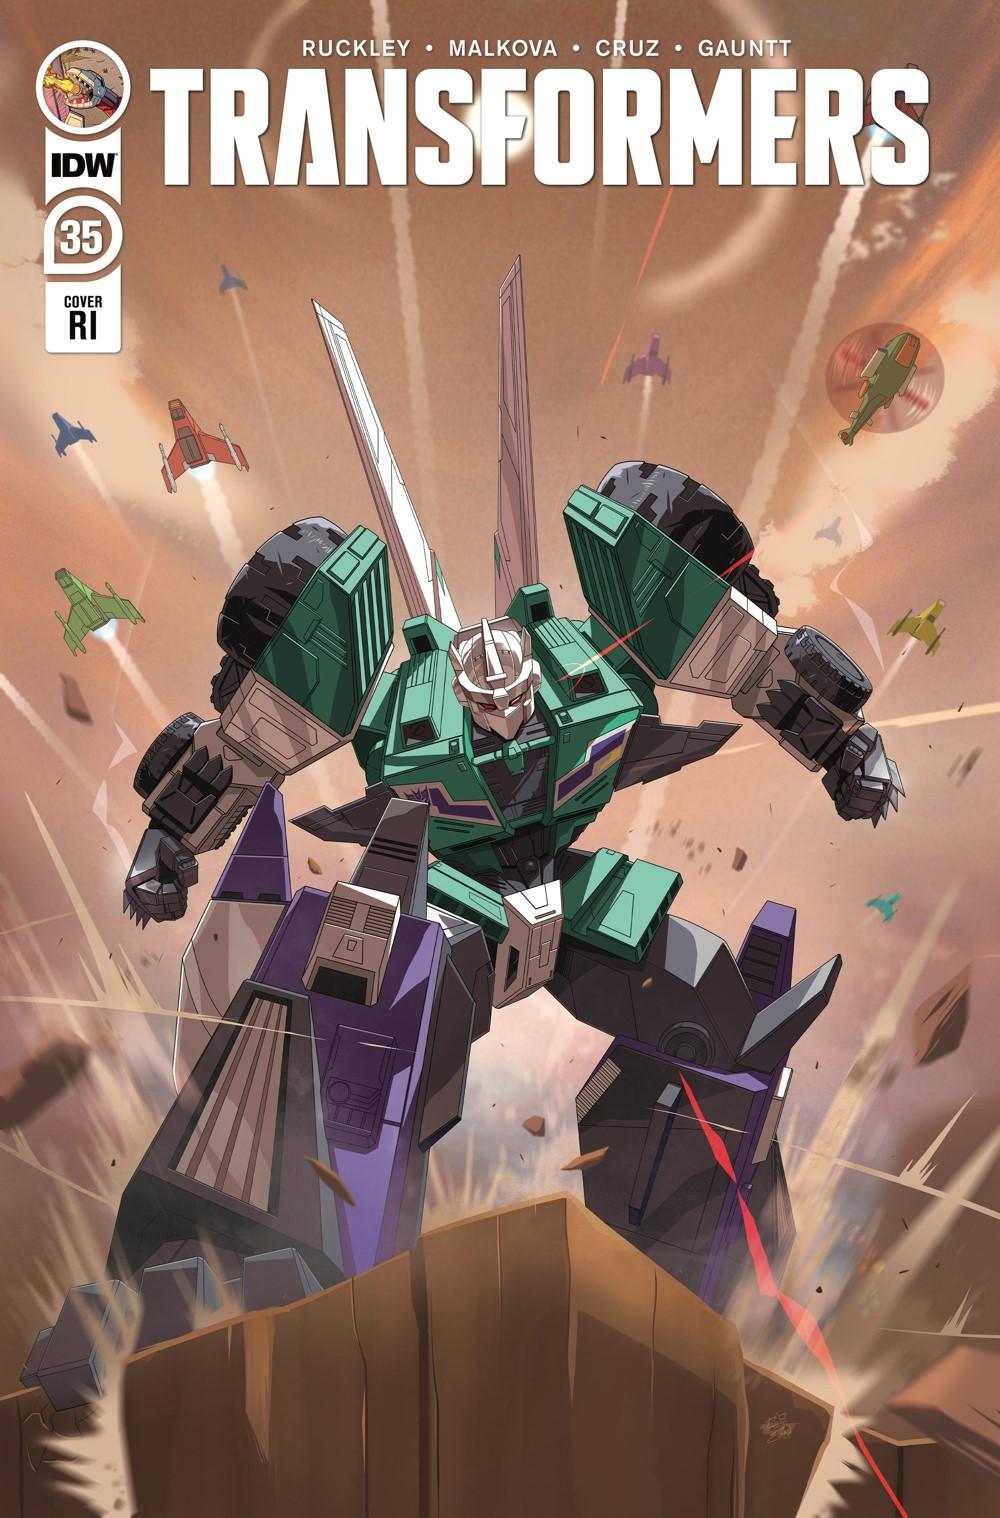 TF35-cvr-RI ComicList: IDW Publishing New Releases for 09/22/2021